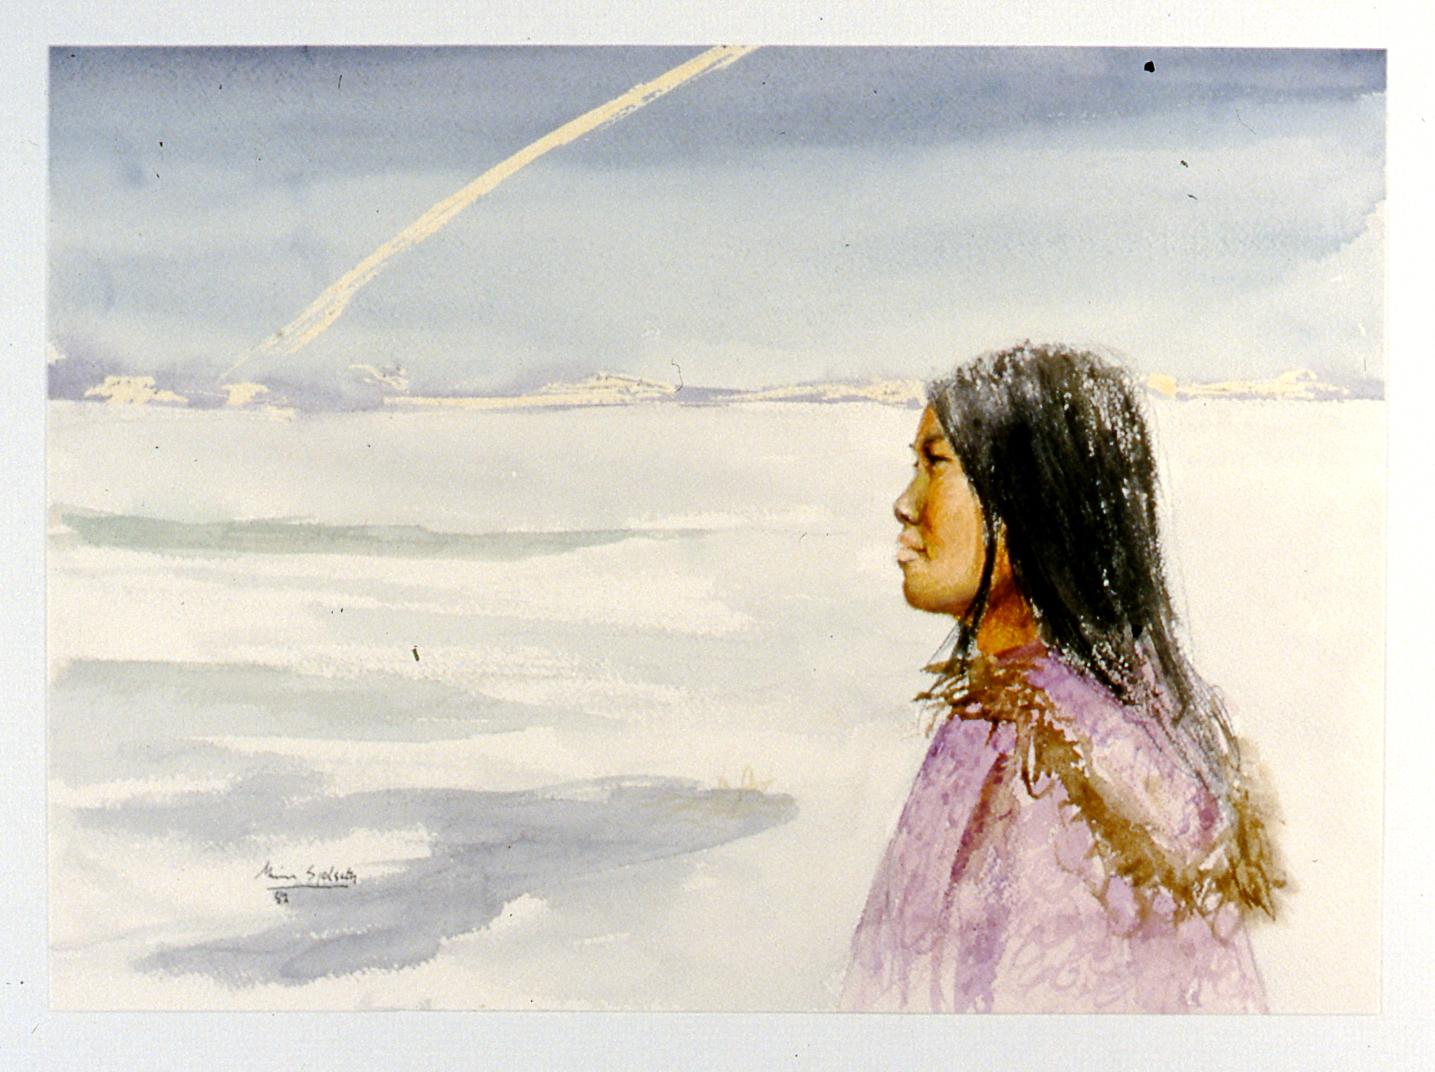 "Contrail, 1982, Minn Sjølseth, watercolour, 9 1/2"" x 13 1/2"", 2000.04.04, gift of Al and Laila Campbell"